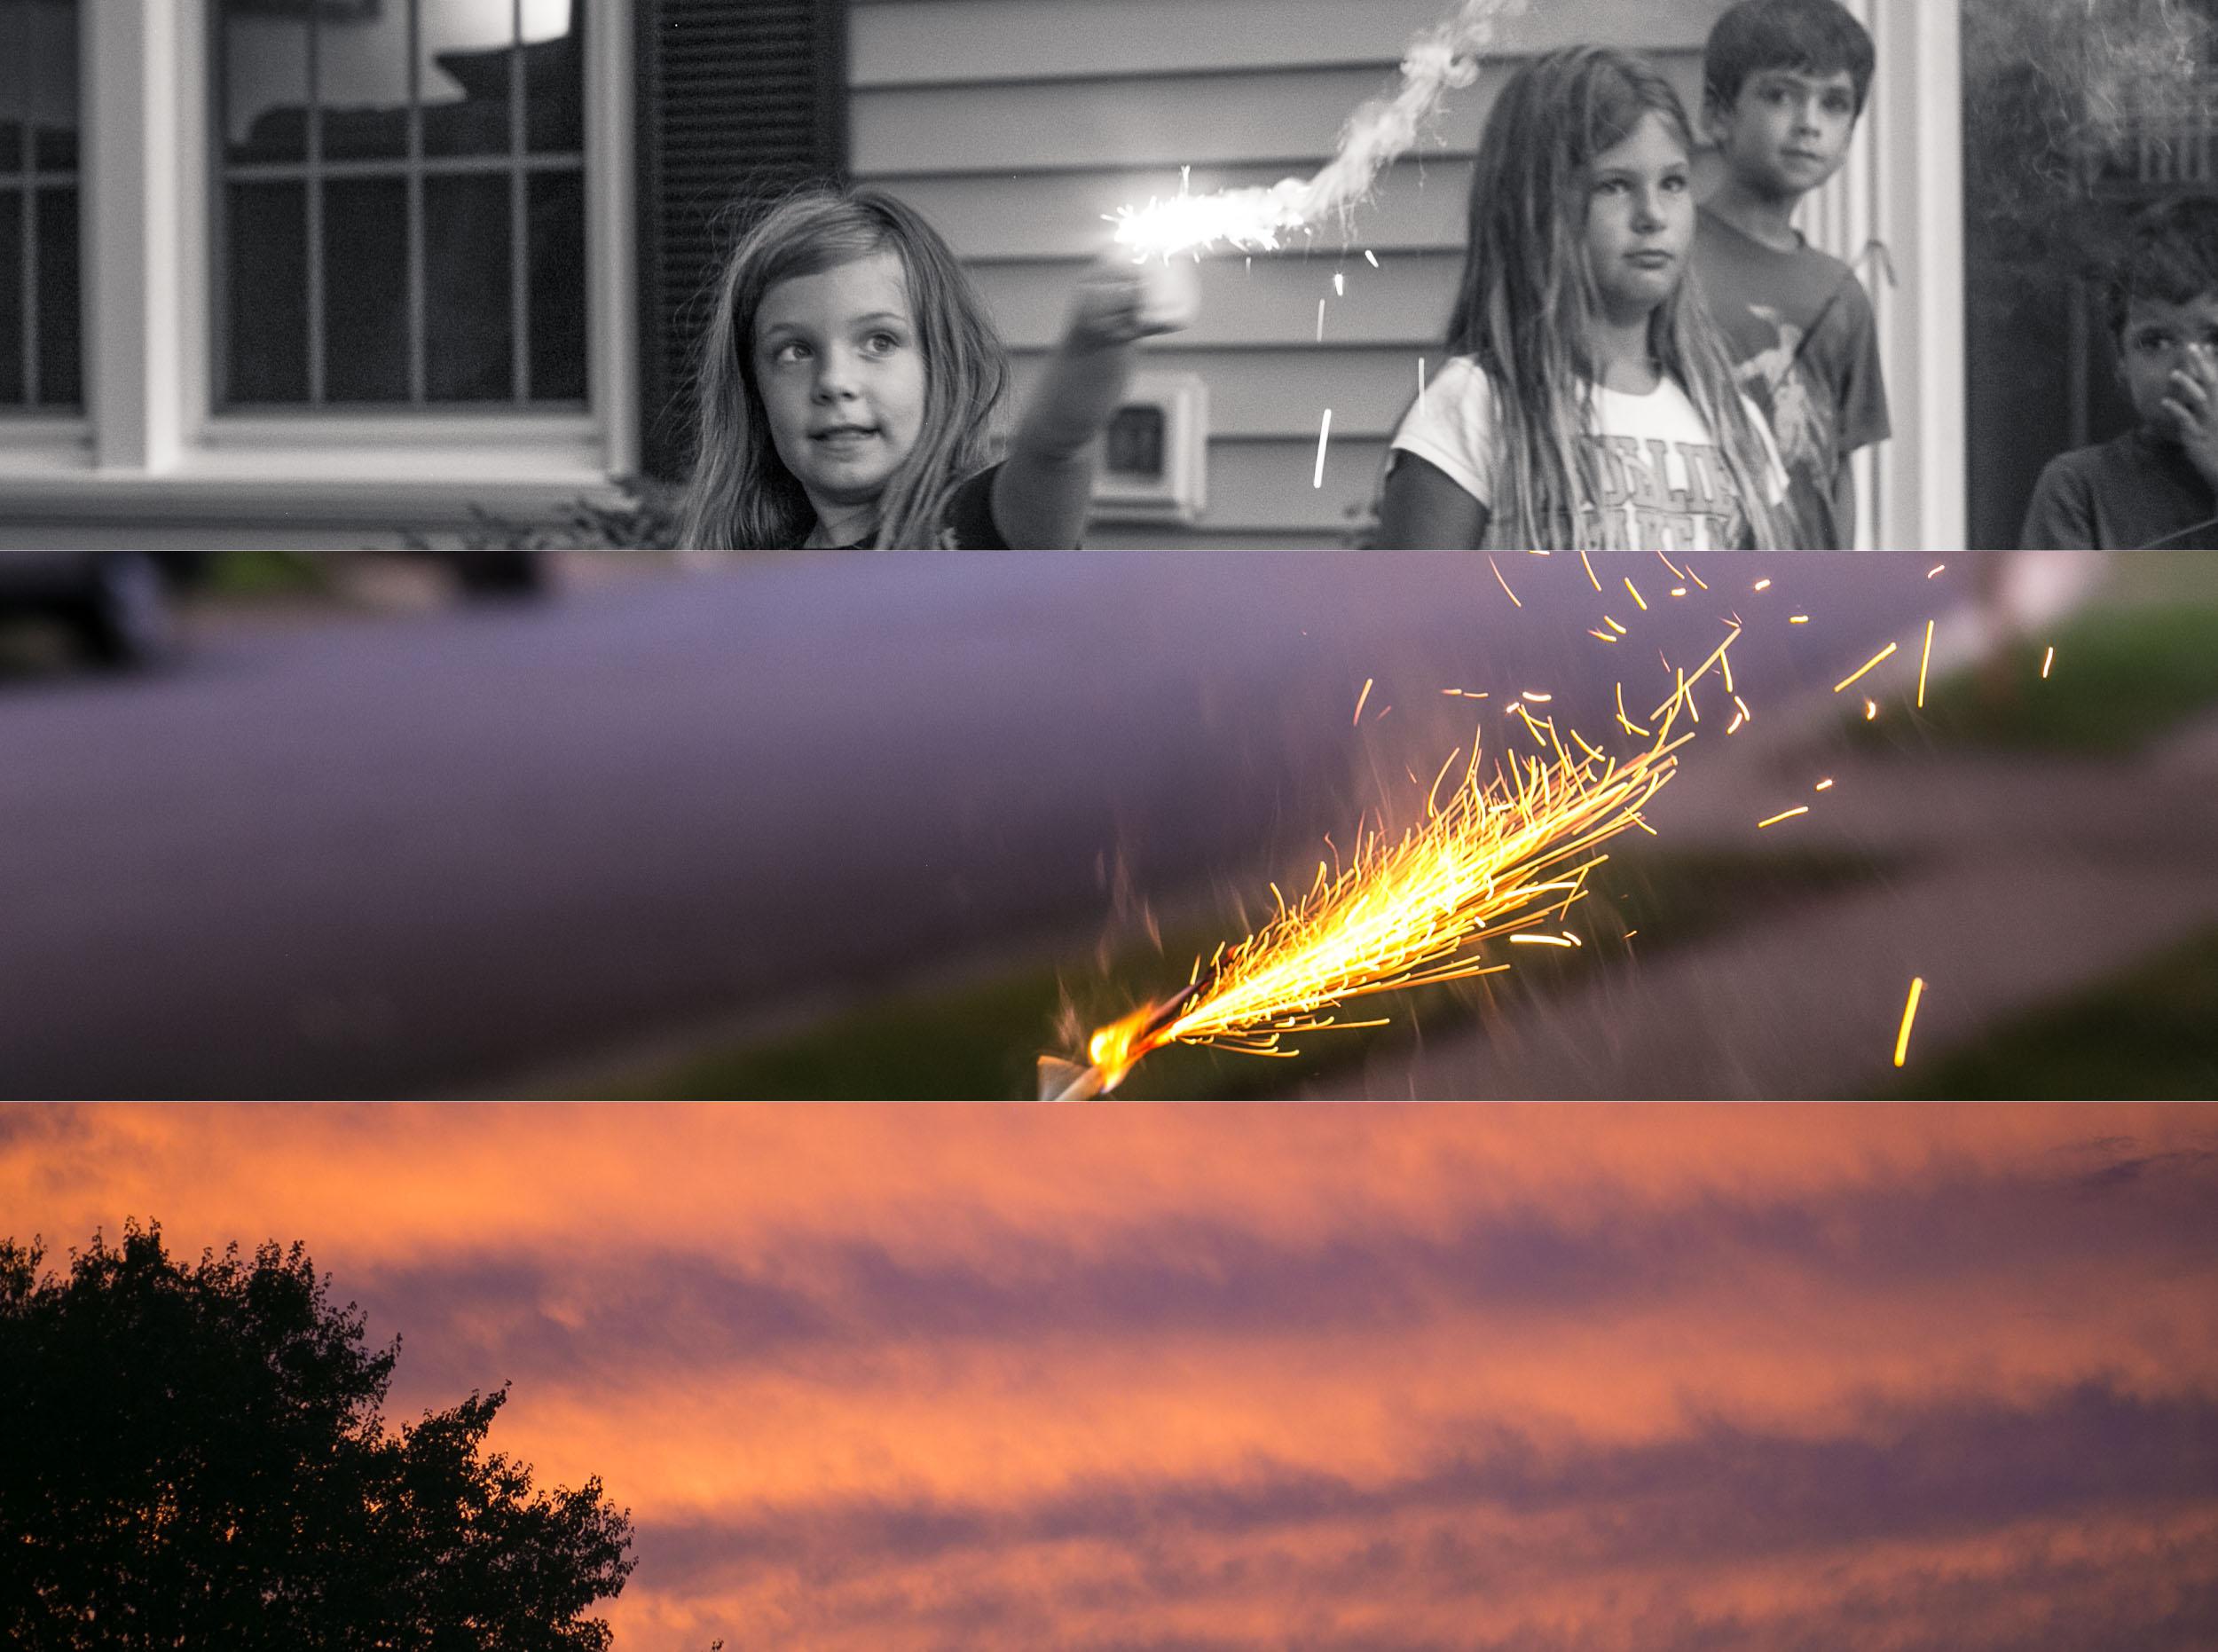 sparklers-1